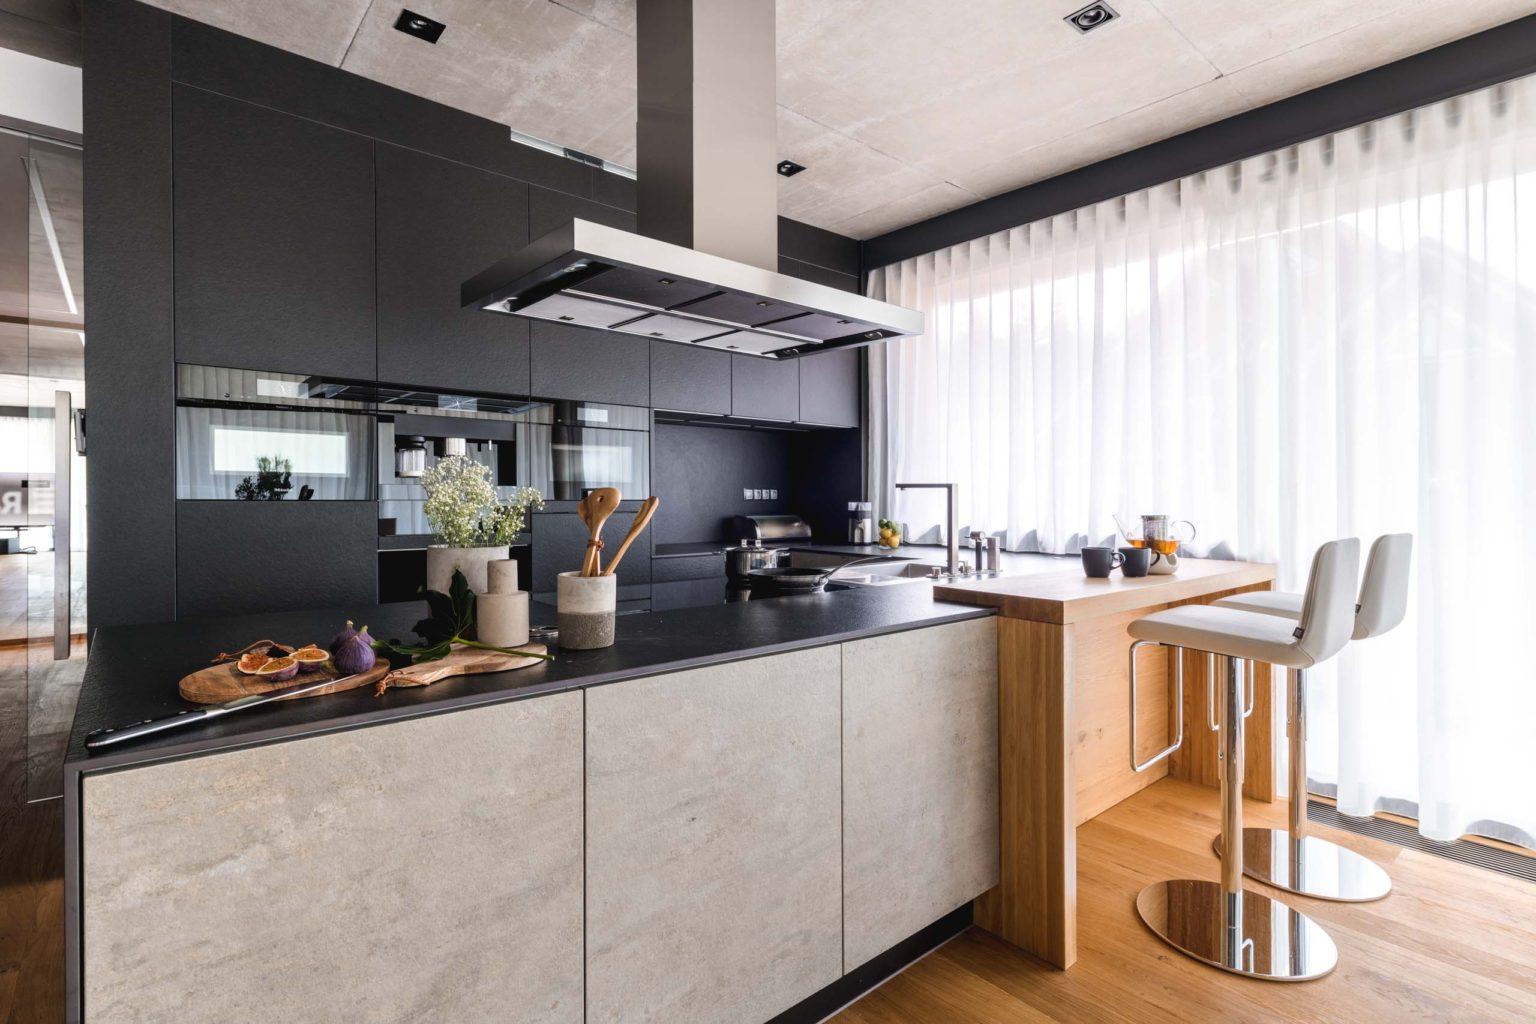 tmava moderni kuchyne sykora, jednoduche linie cisty design